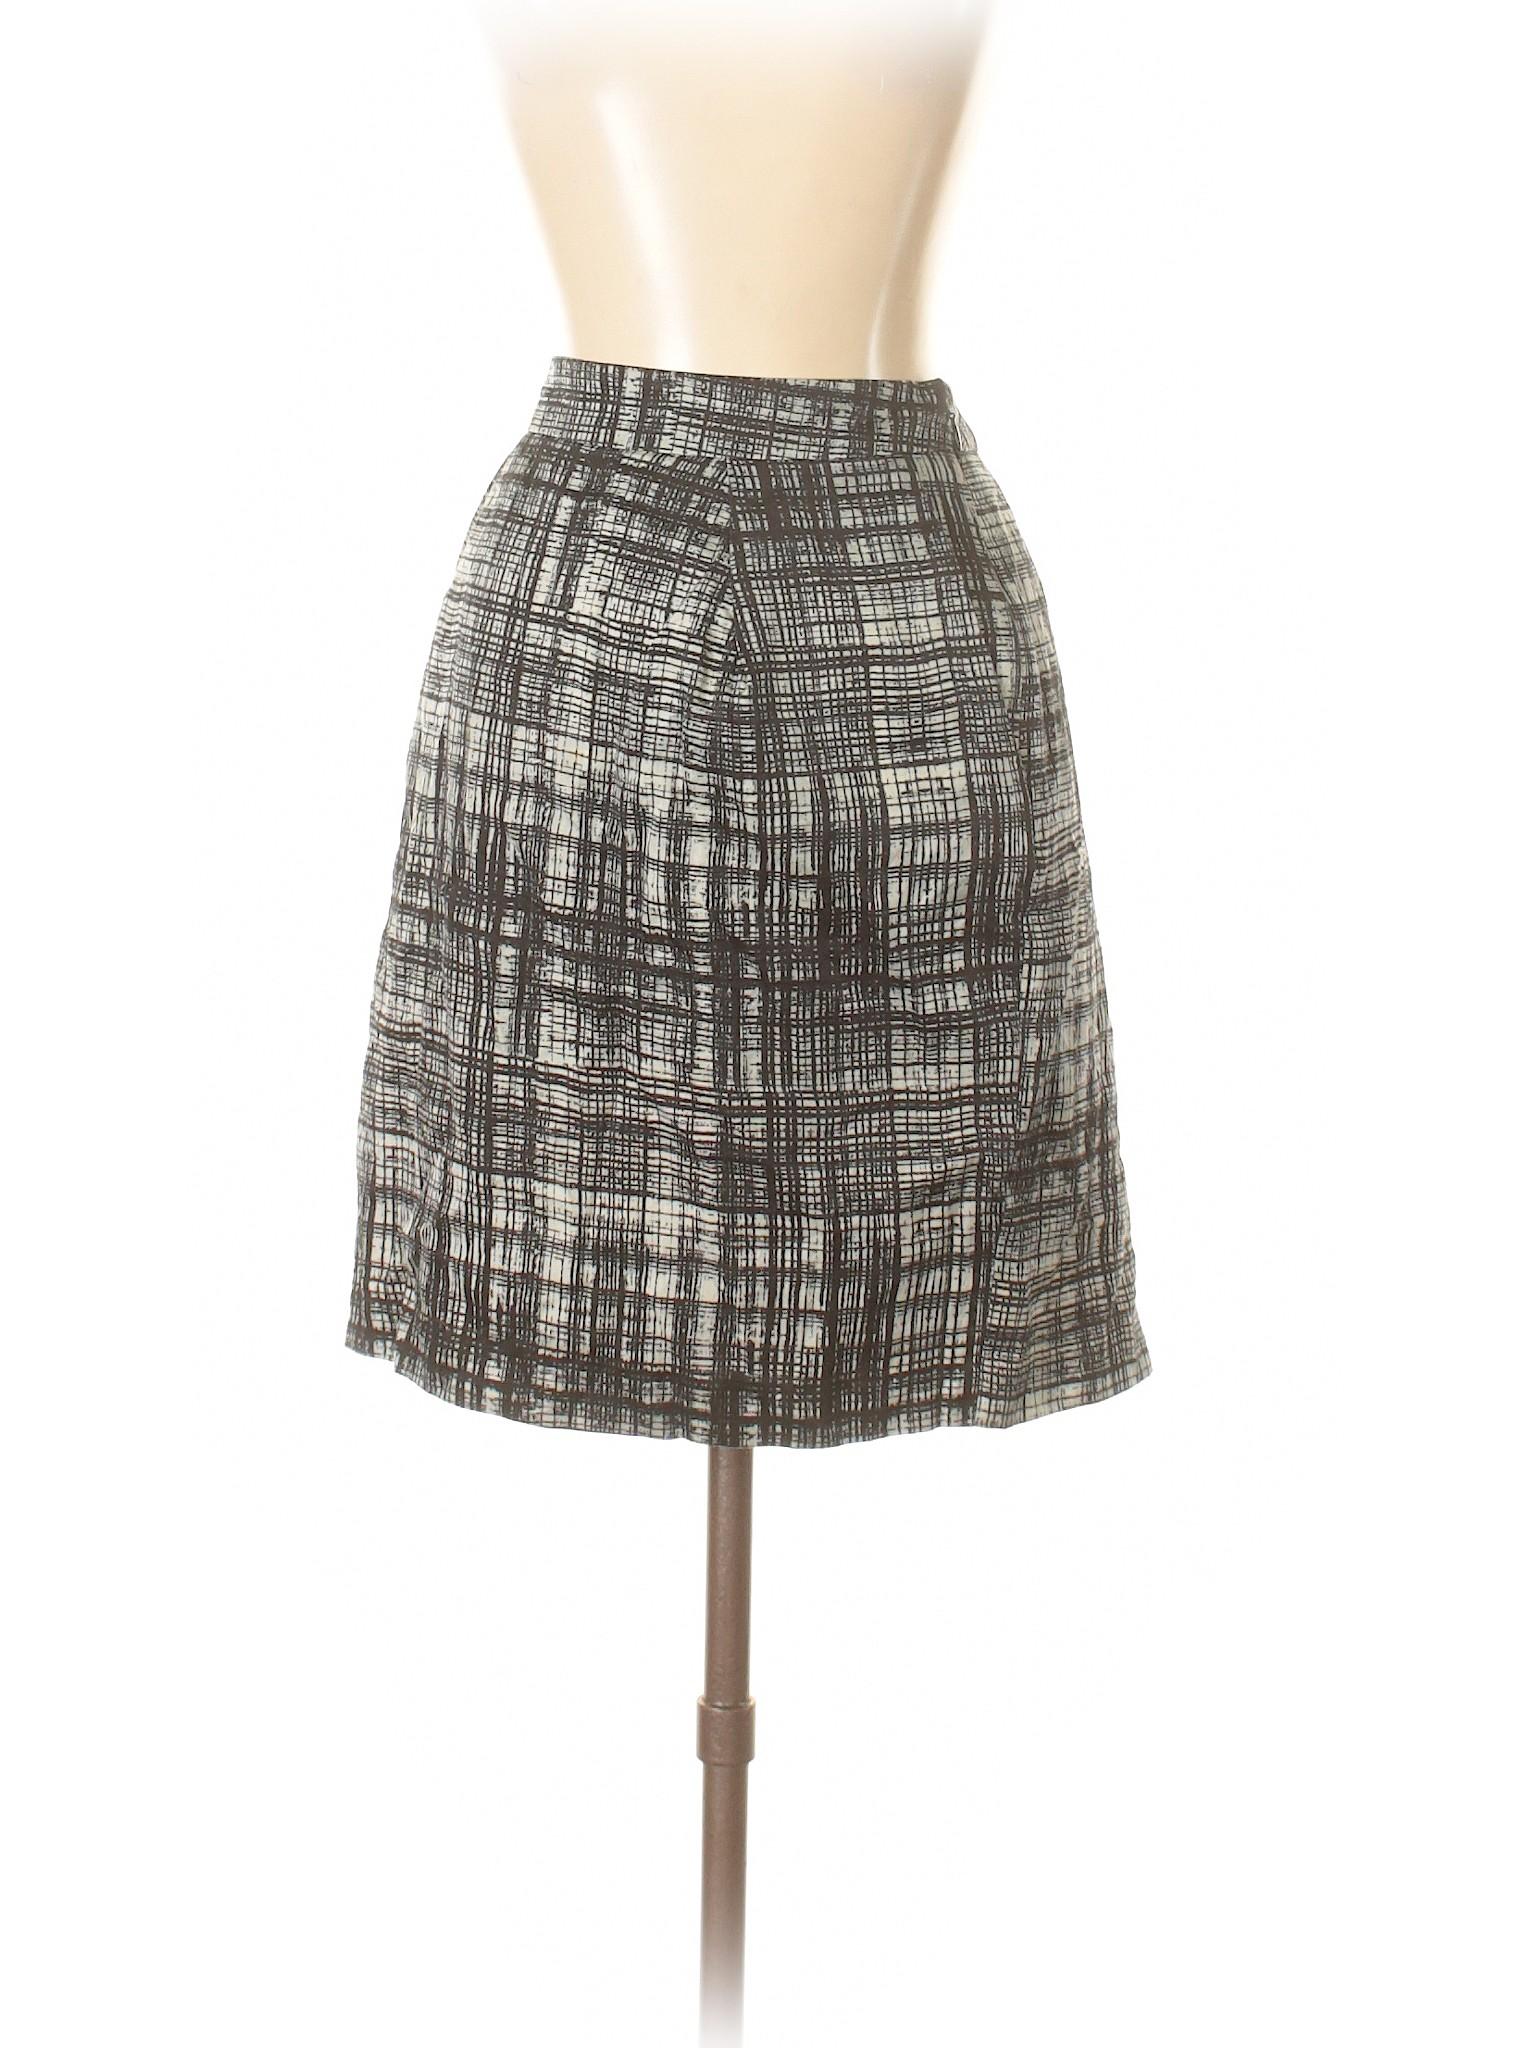 Boutique Boutique Skirt Skirt Casual Boutique Skirt Skirt Casual Casual Casual Boutique Hw5qZqE